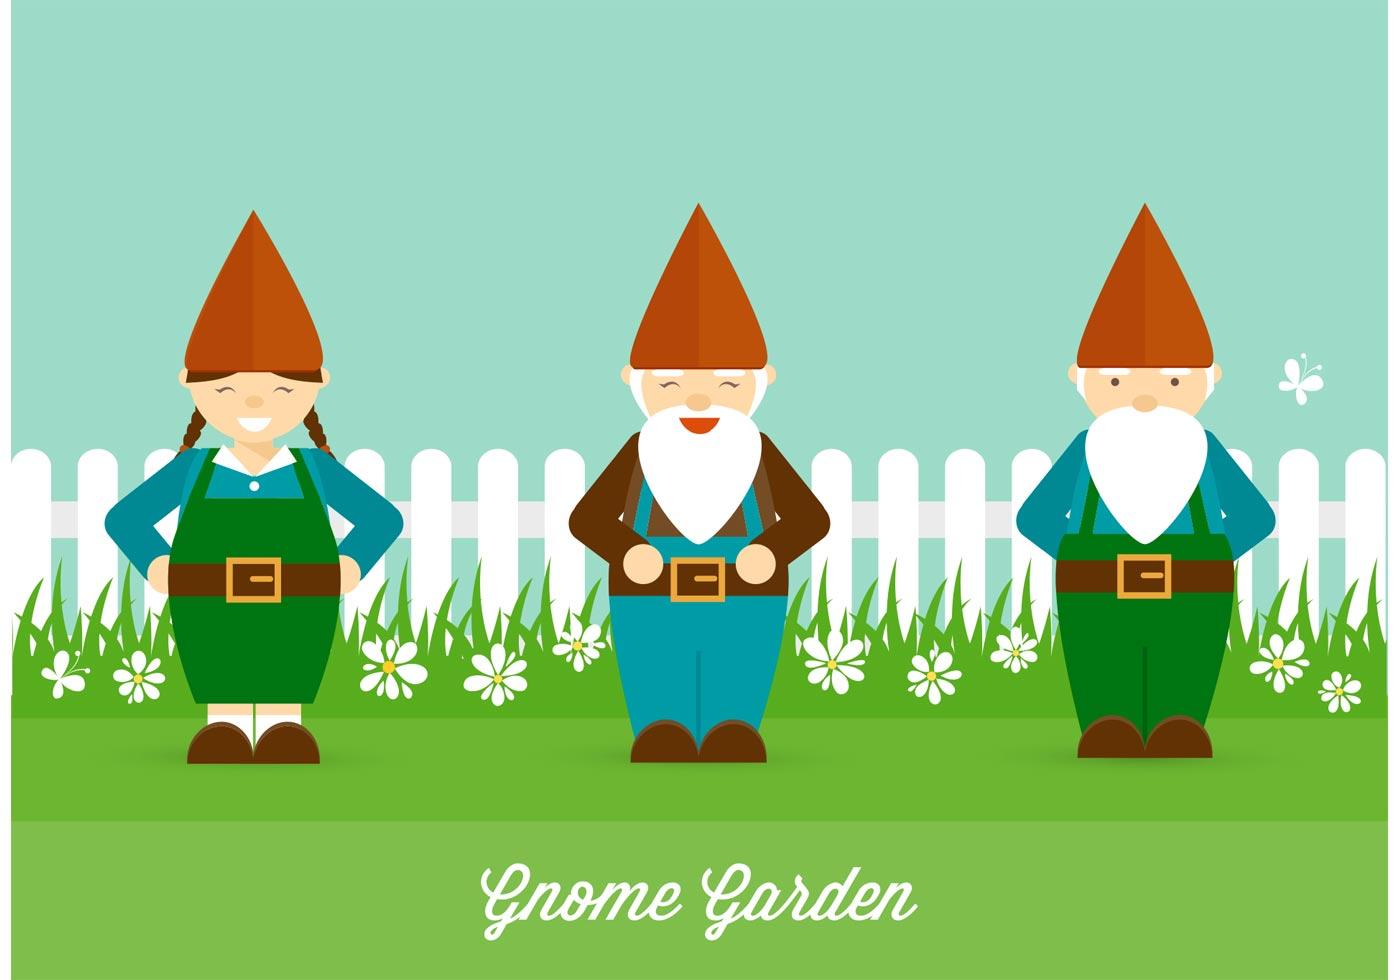 Gardener Man Free Vector Art 7016 Free Downloads